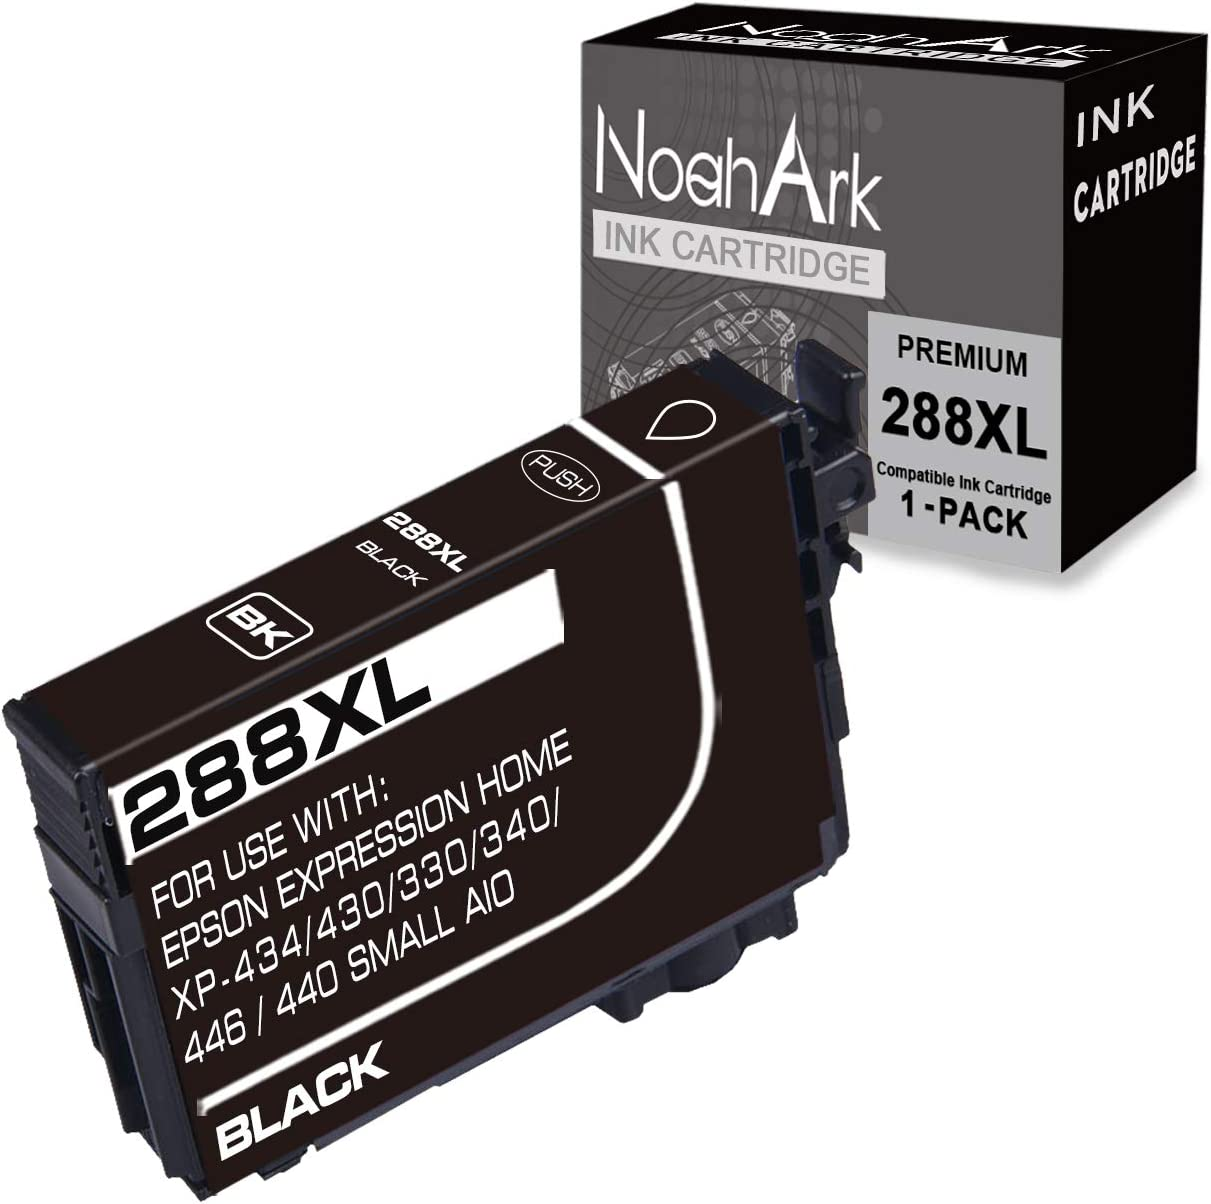 NoahArk 1 Pack 288XL Remanufacture Ink Cartridges Replacement for Epson 288 XL 288XL T288XL for Expression Home XP-430 XP-440 XP-330 XP-340 XP-434 XP-446 Printer (1 Black)